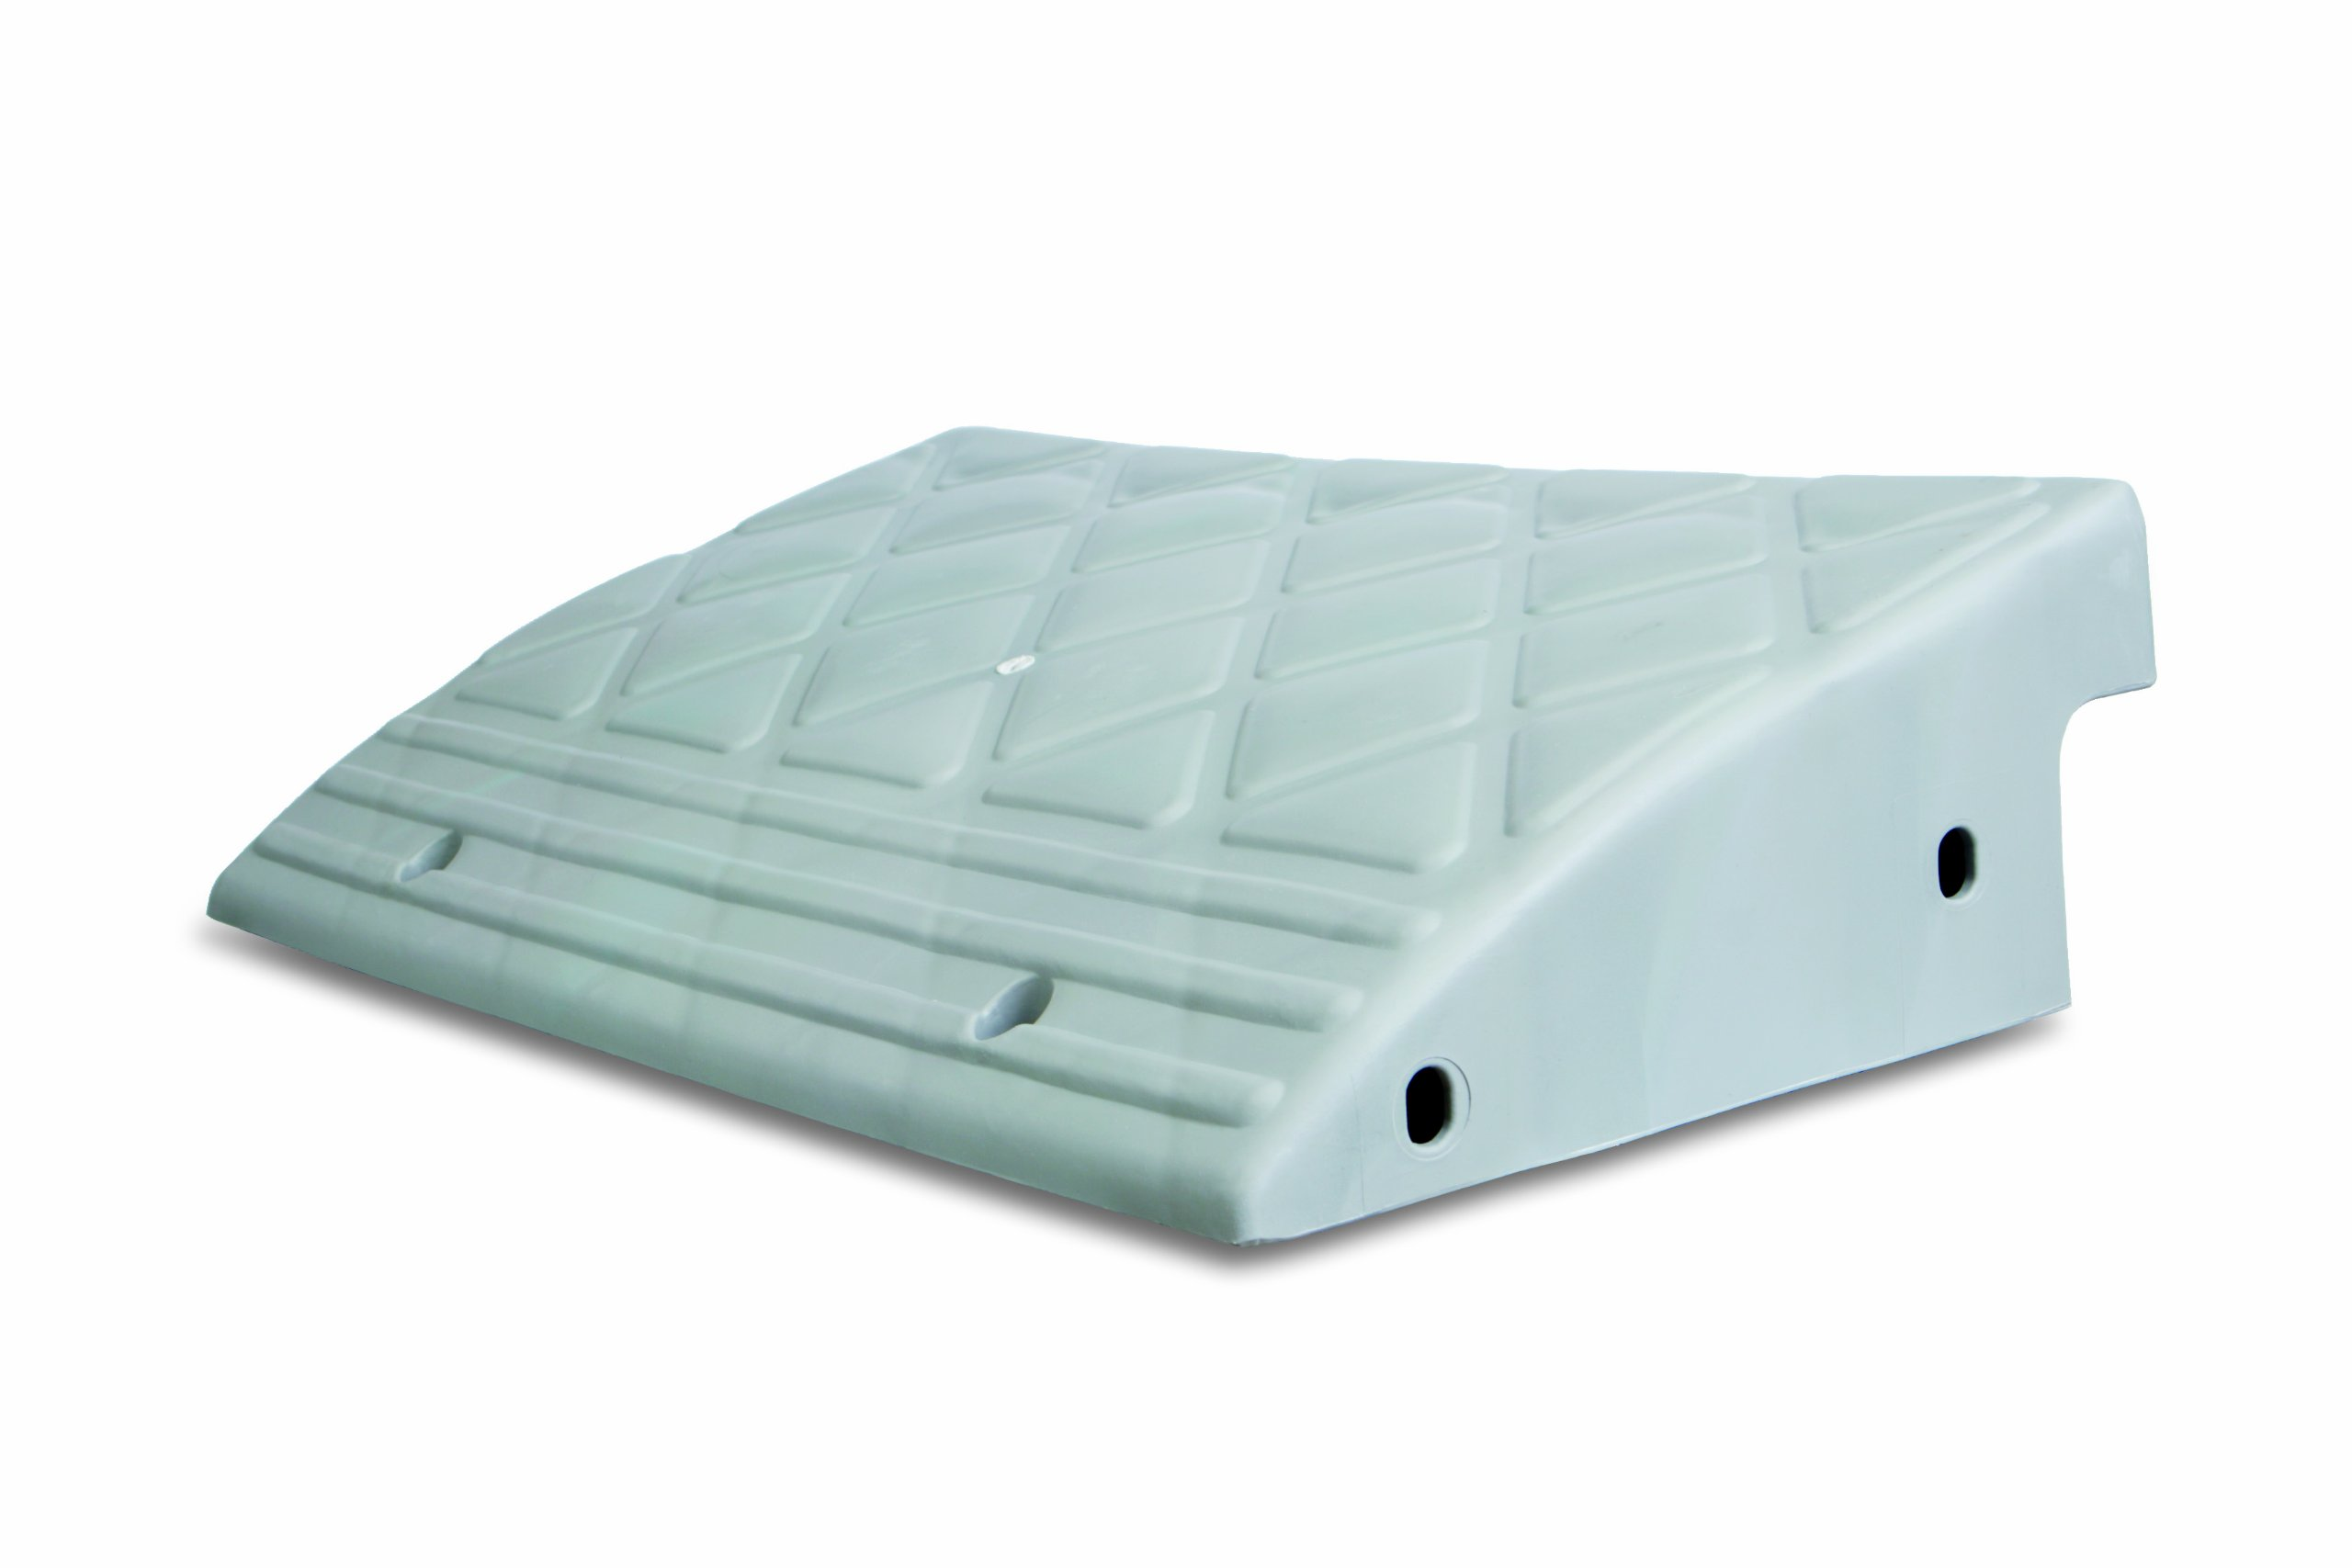 MAXSA Curb Ramp. Durable, Lightweight Plastic Multi-purpose Ramp to Bridge Curbs/Steps for Wheelchairs, Cars, Trucks & Carts Grey 20031